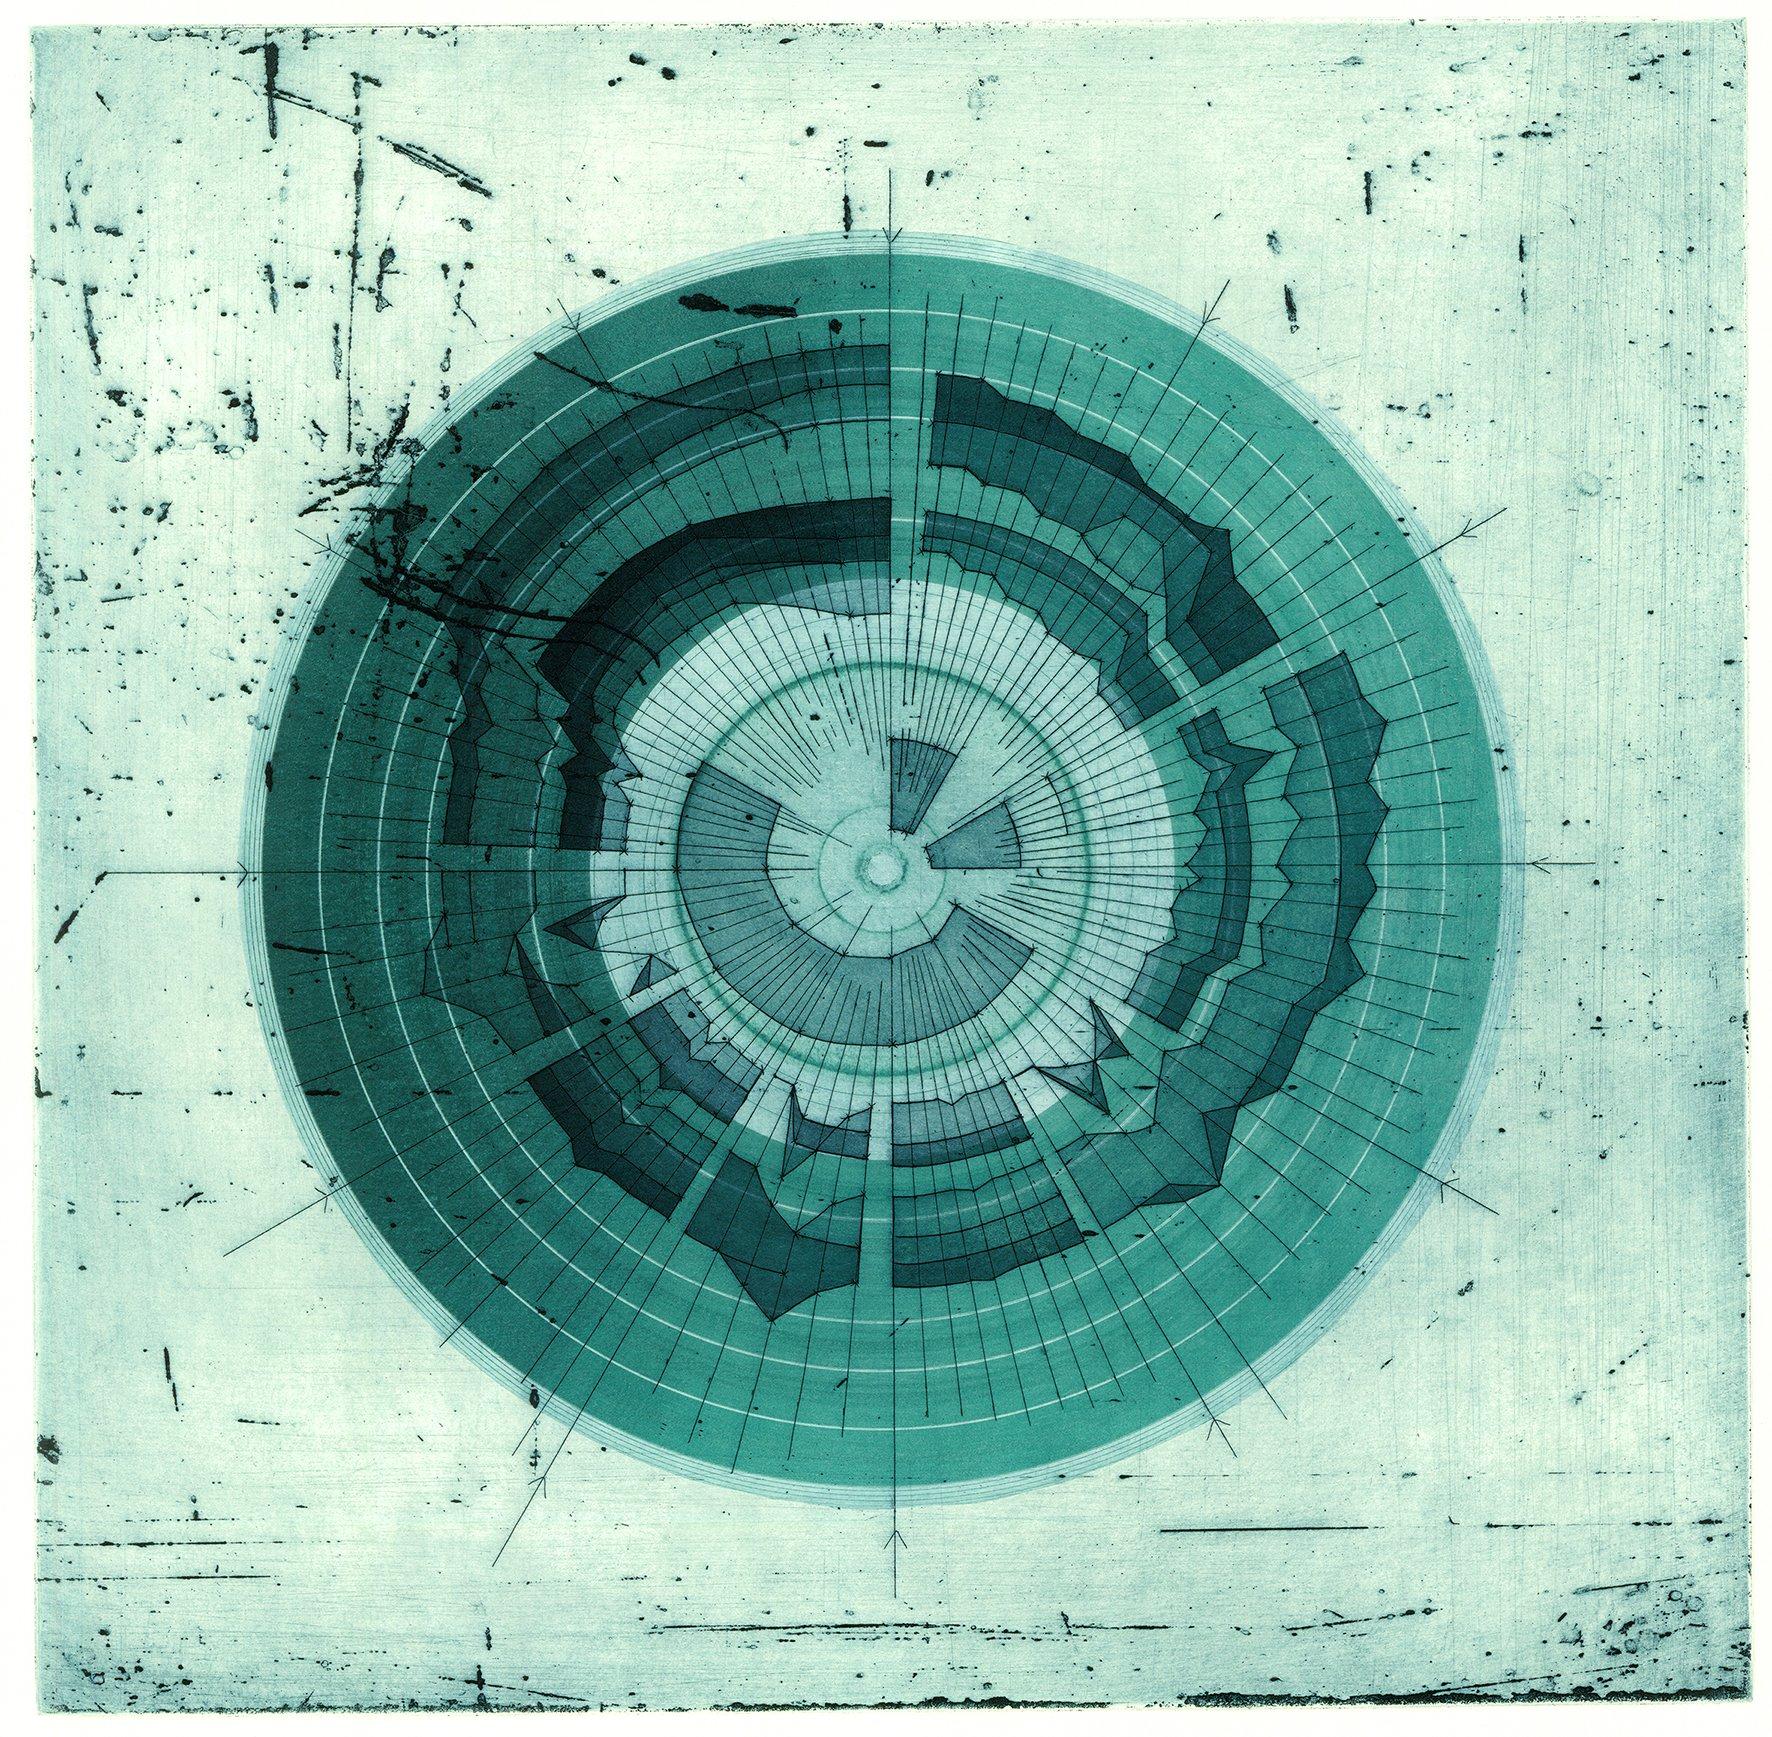 Liz K Miller, vinyl etching, turquoise